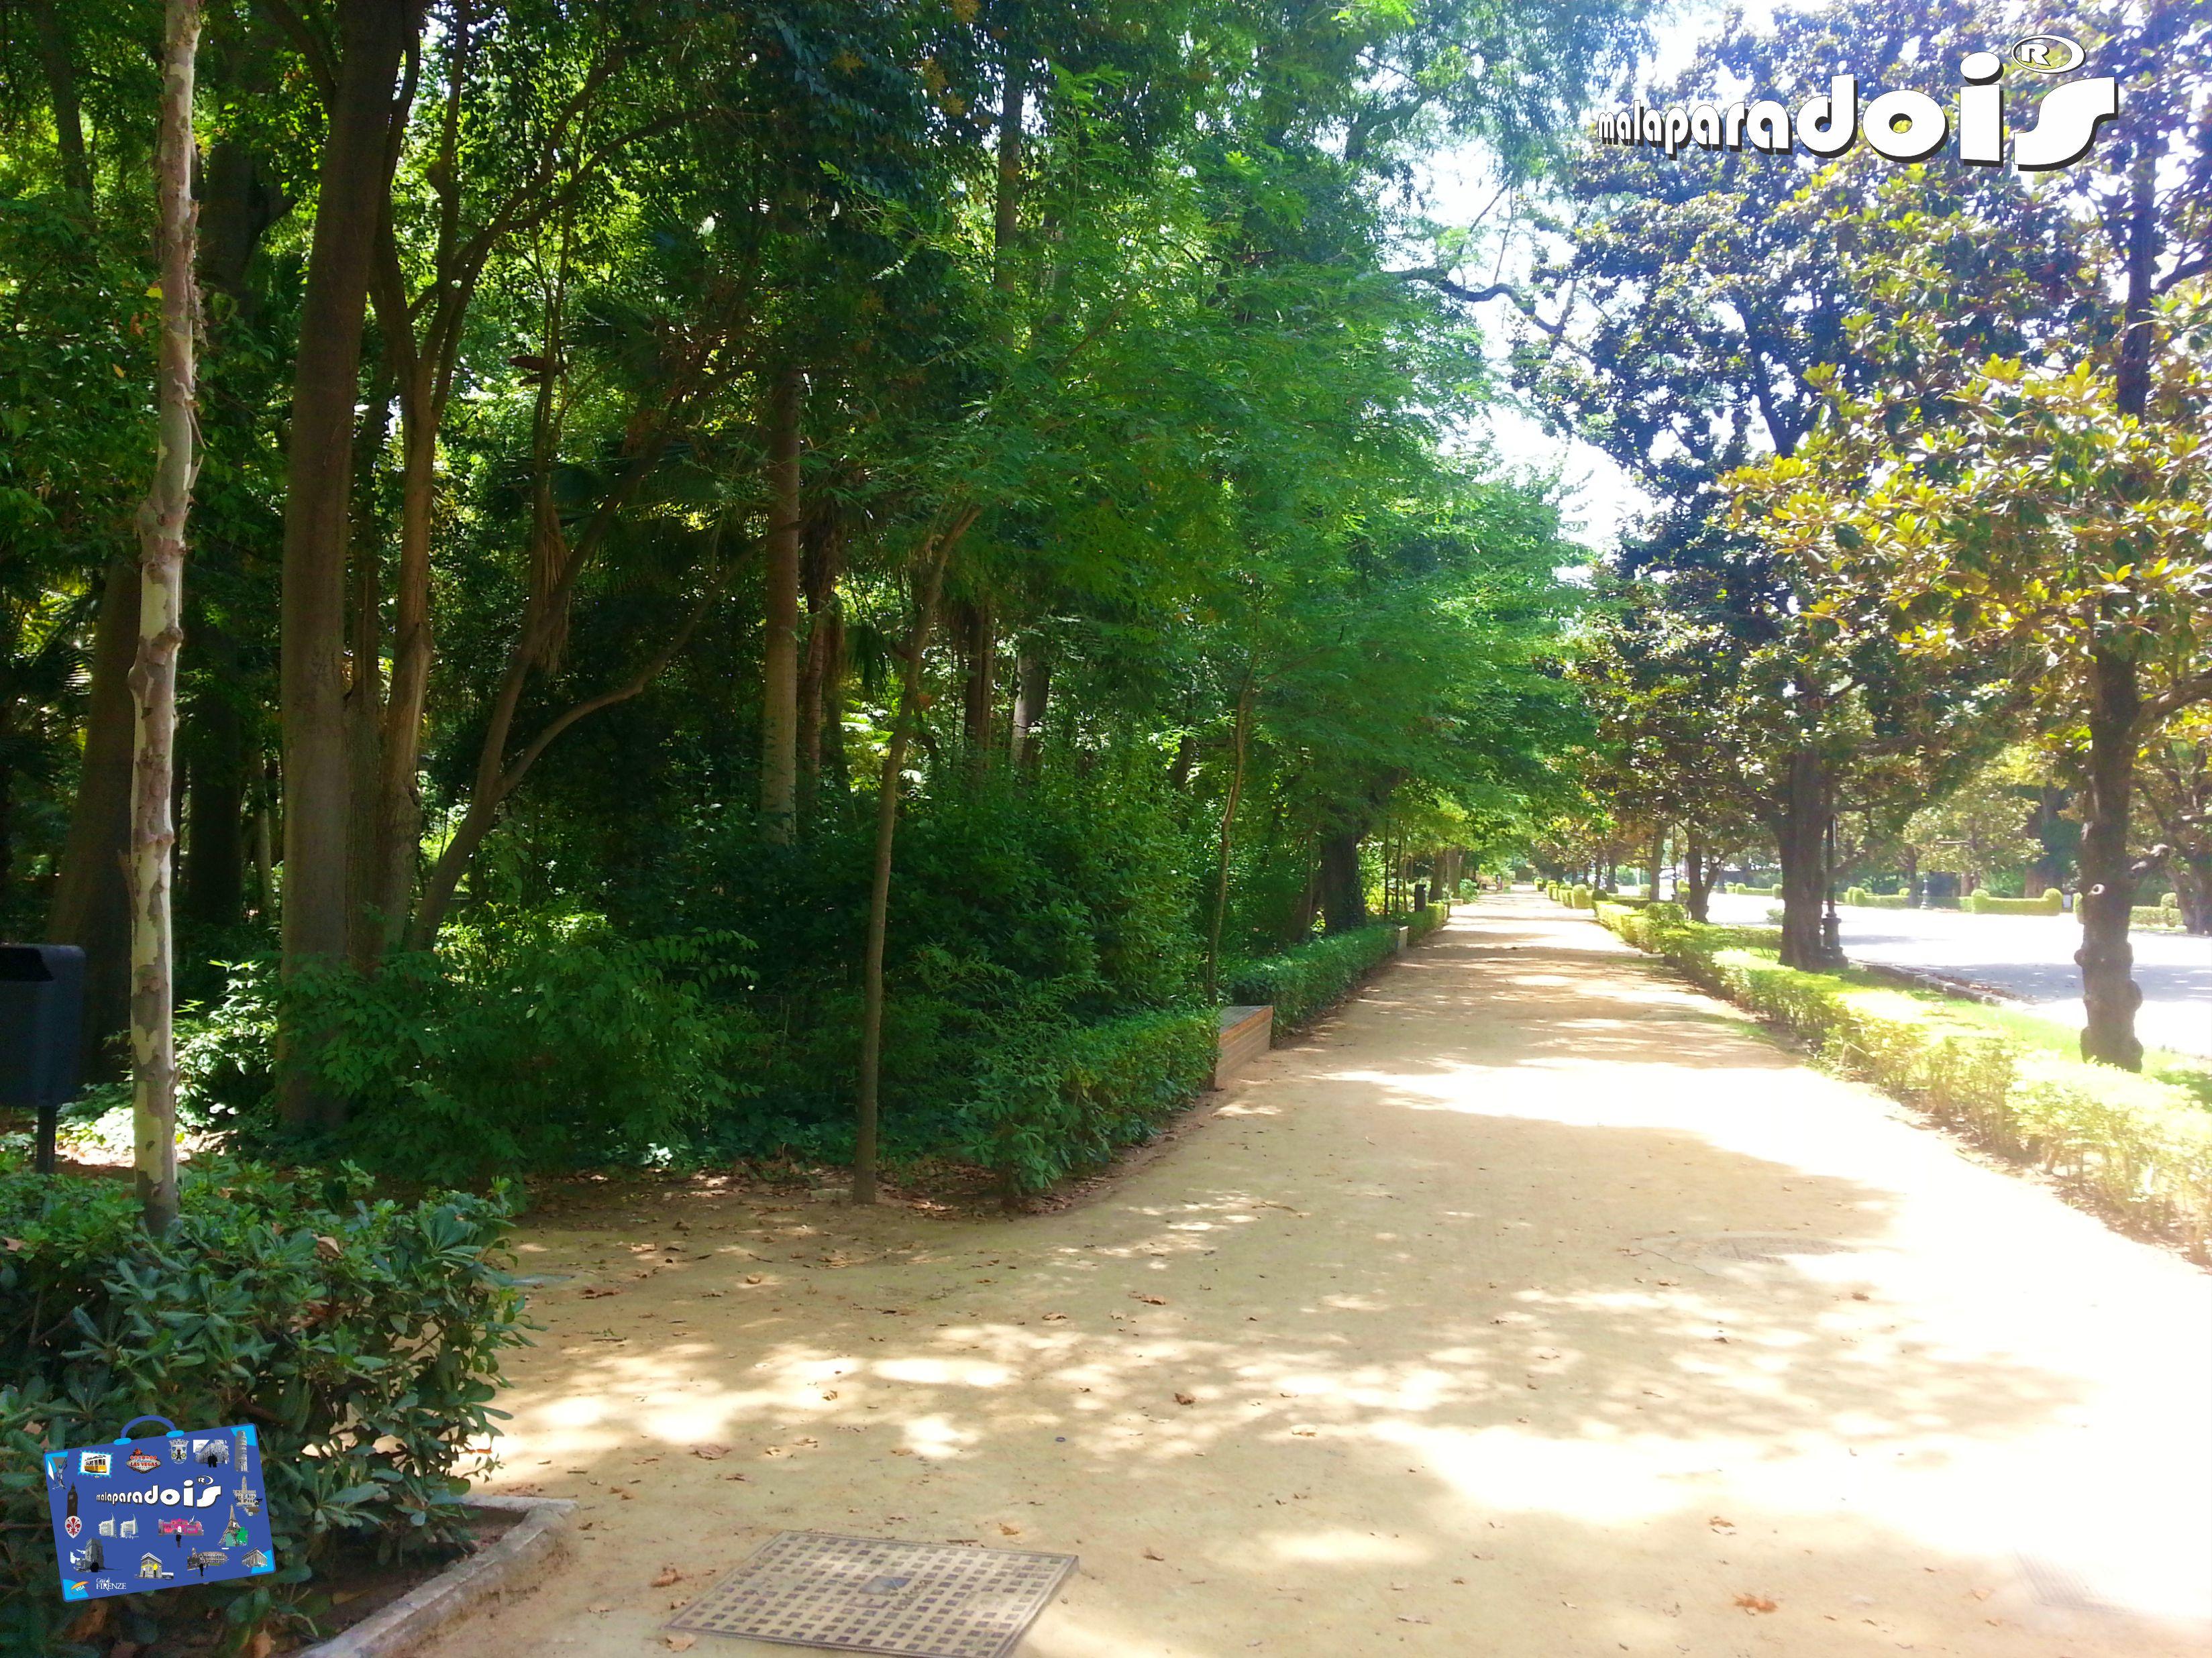 Parque Maria Luiza